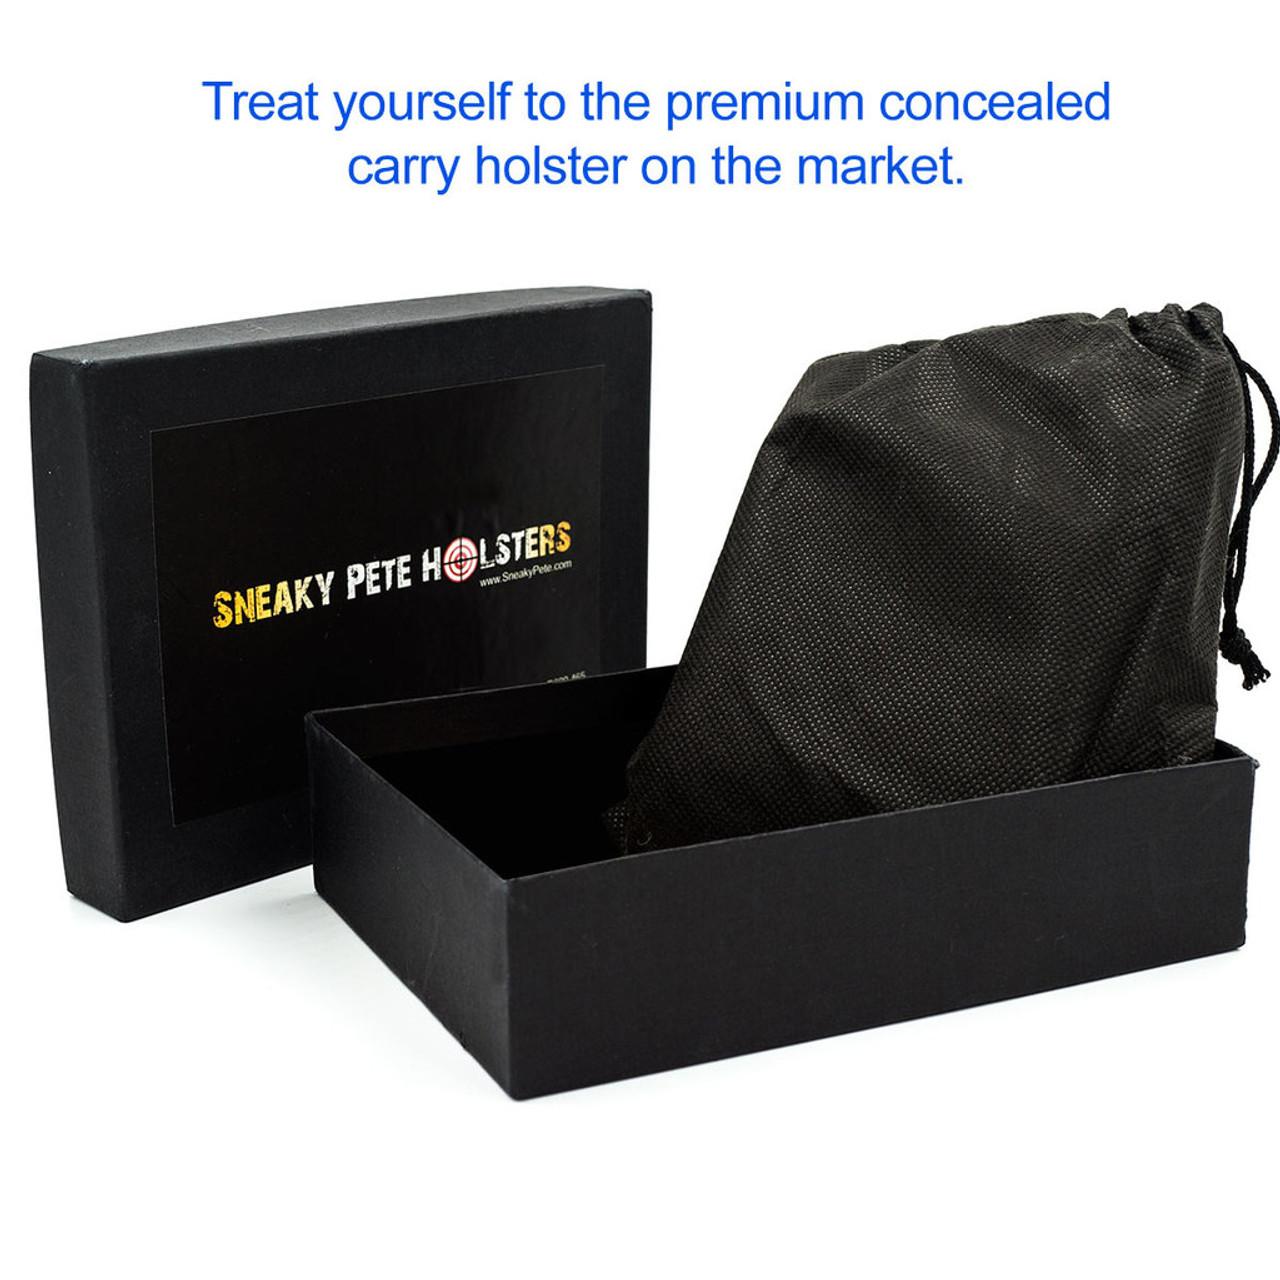 BodyGuard 380 Value Package 3